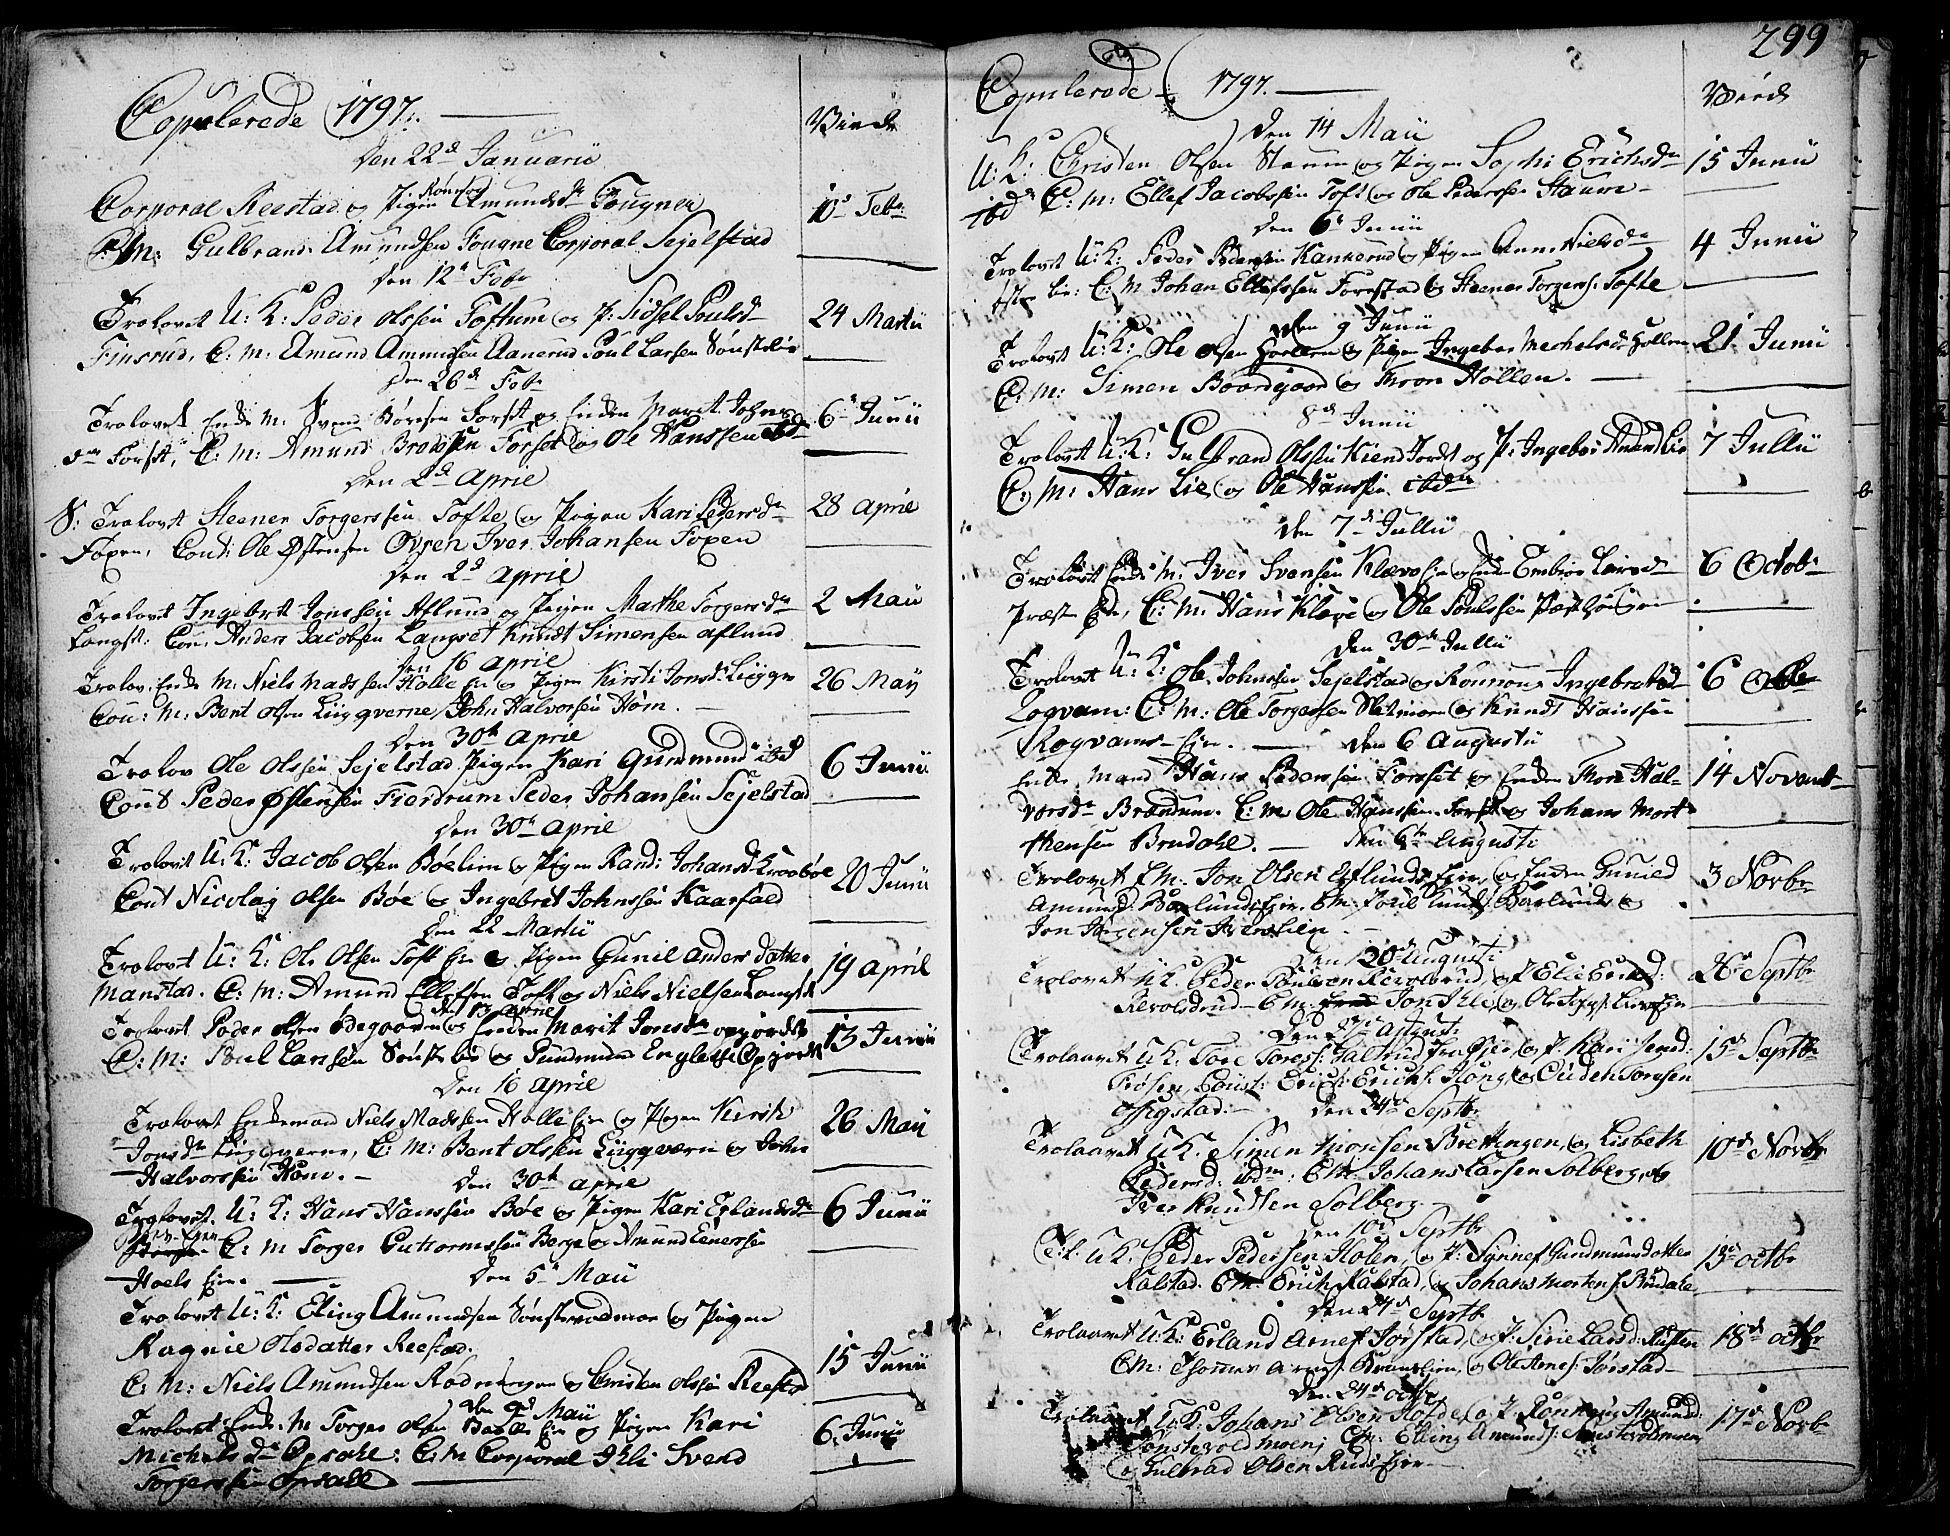 SAH, Gausdal prestekontor, Ministerialbok nr. 3, 1758-1809, s. 299